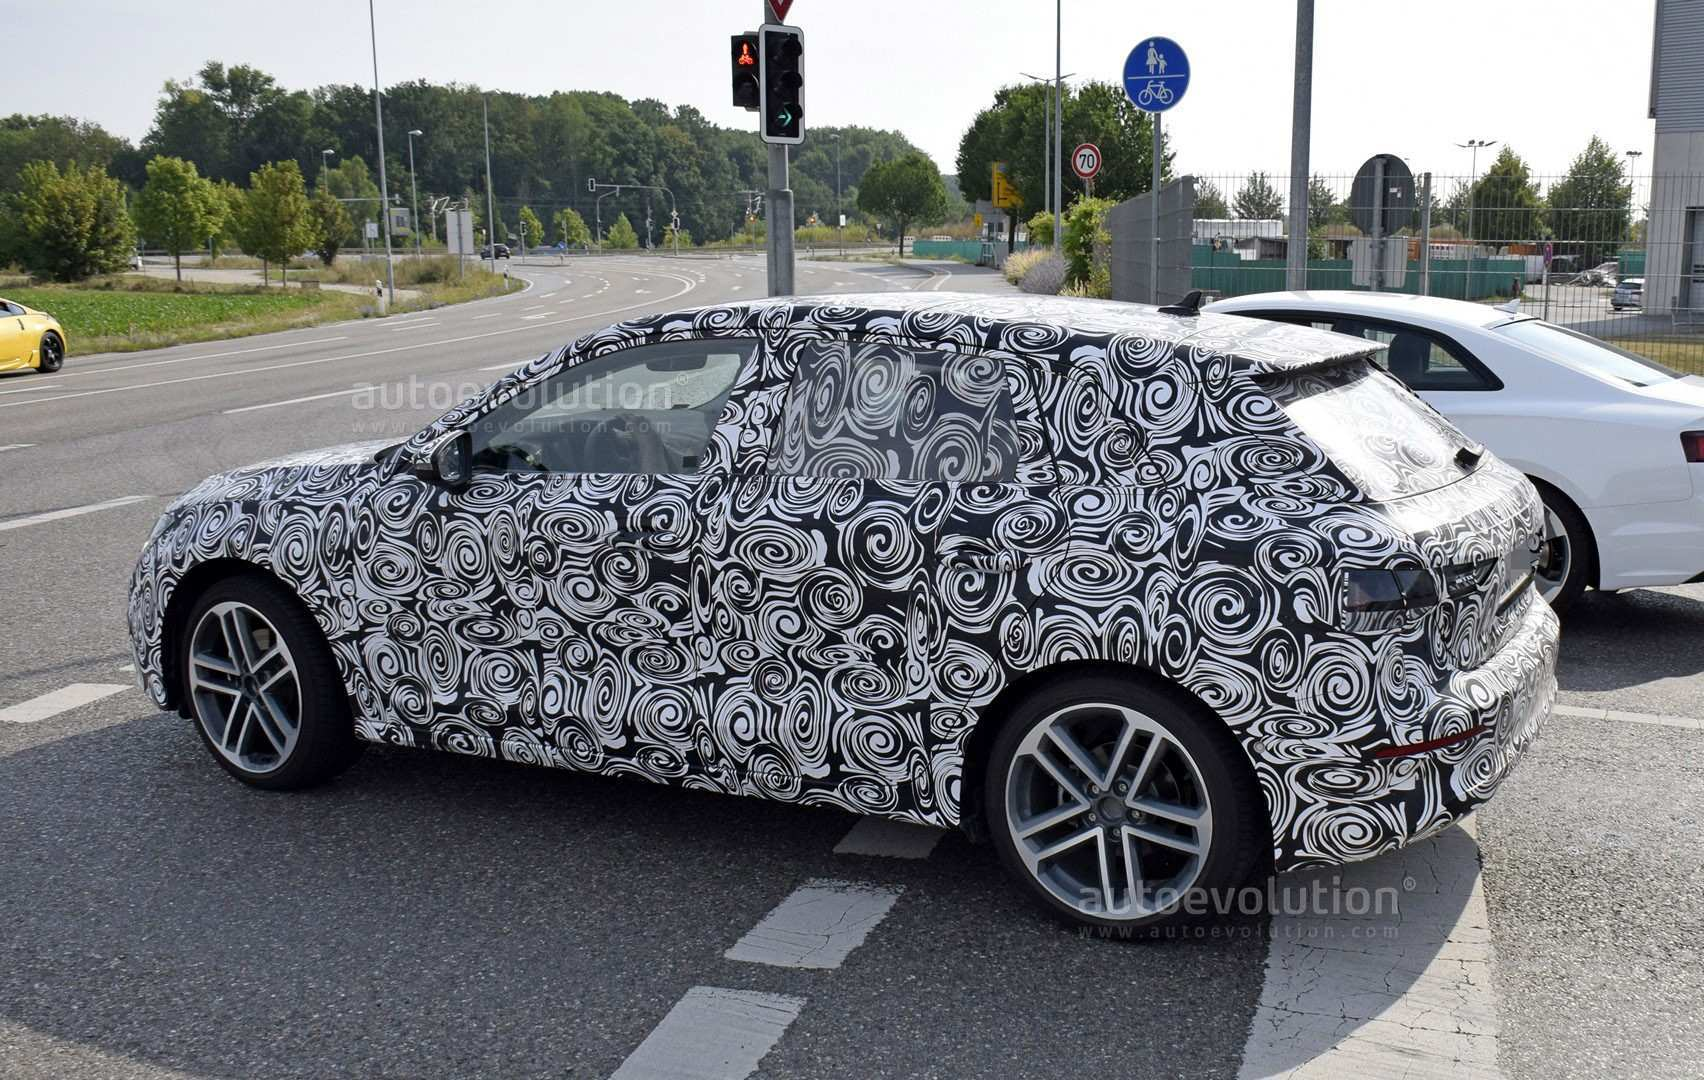 83 Great Audi A3 Hatchback 2020 Exterior and Interior for Audi A3 Hatchback 2020